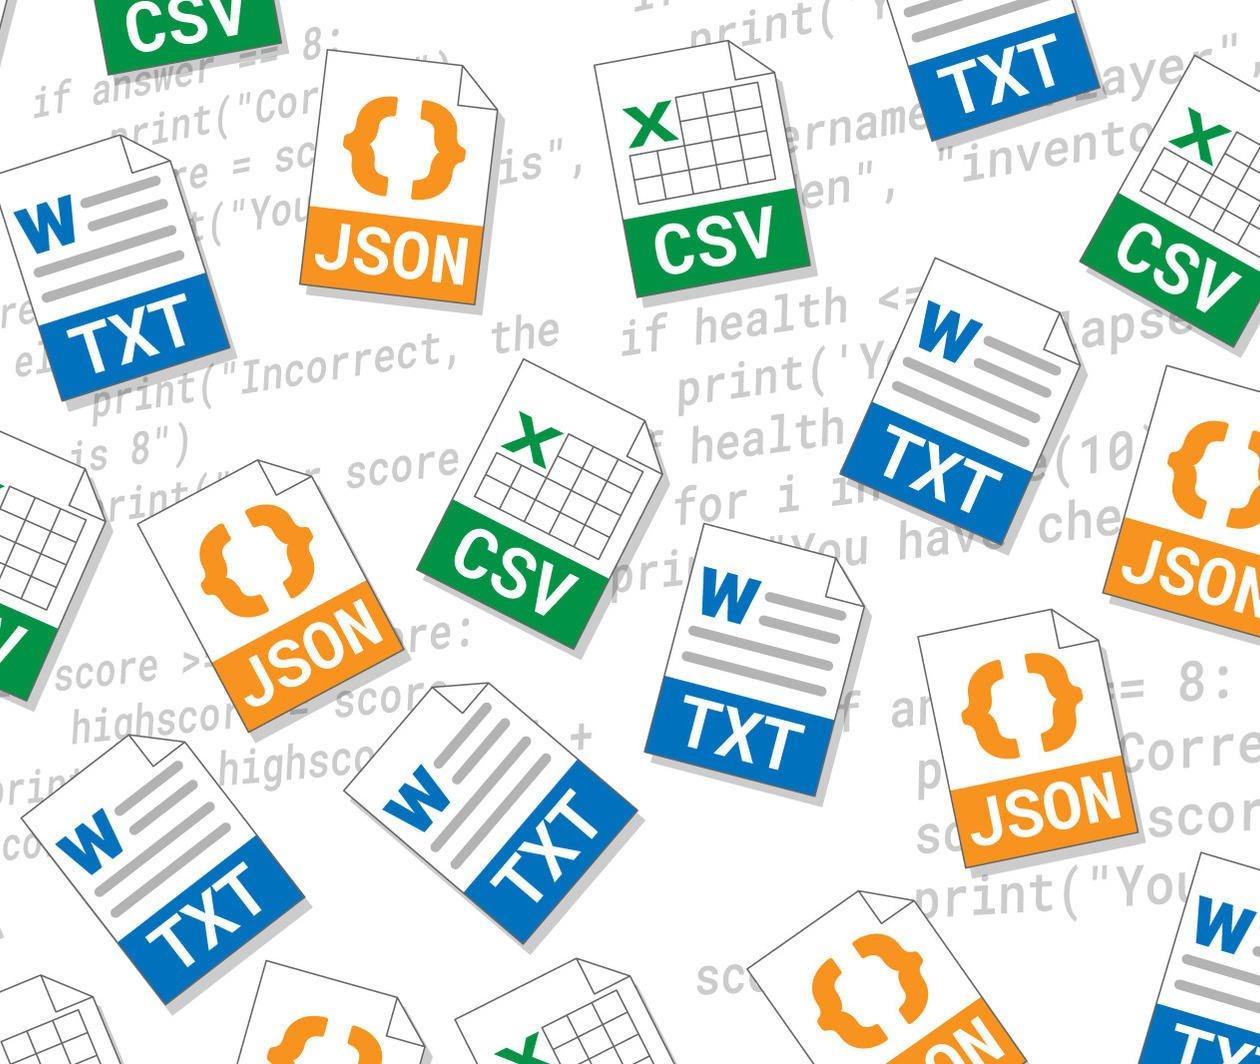 Programming 103: Saving and Structuring Data